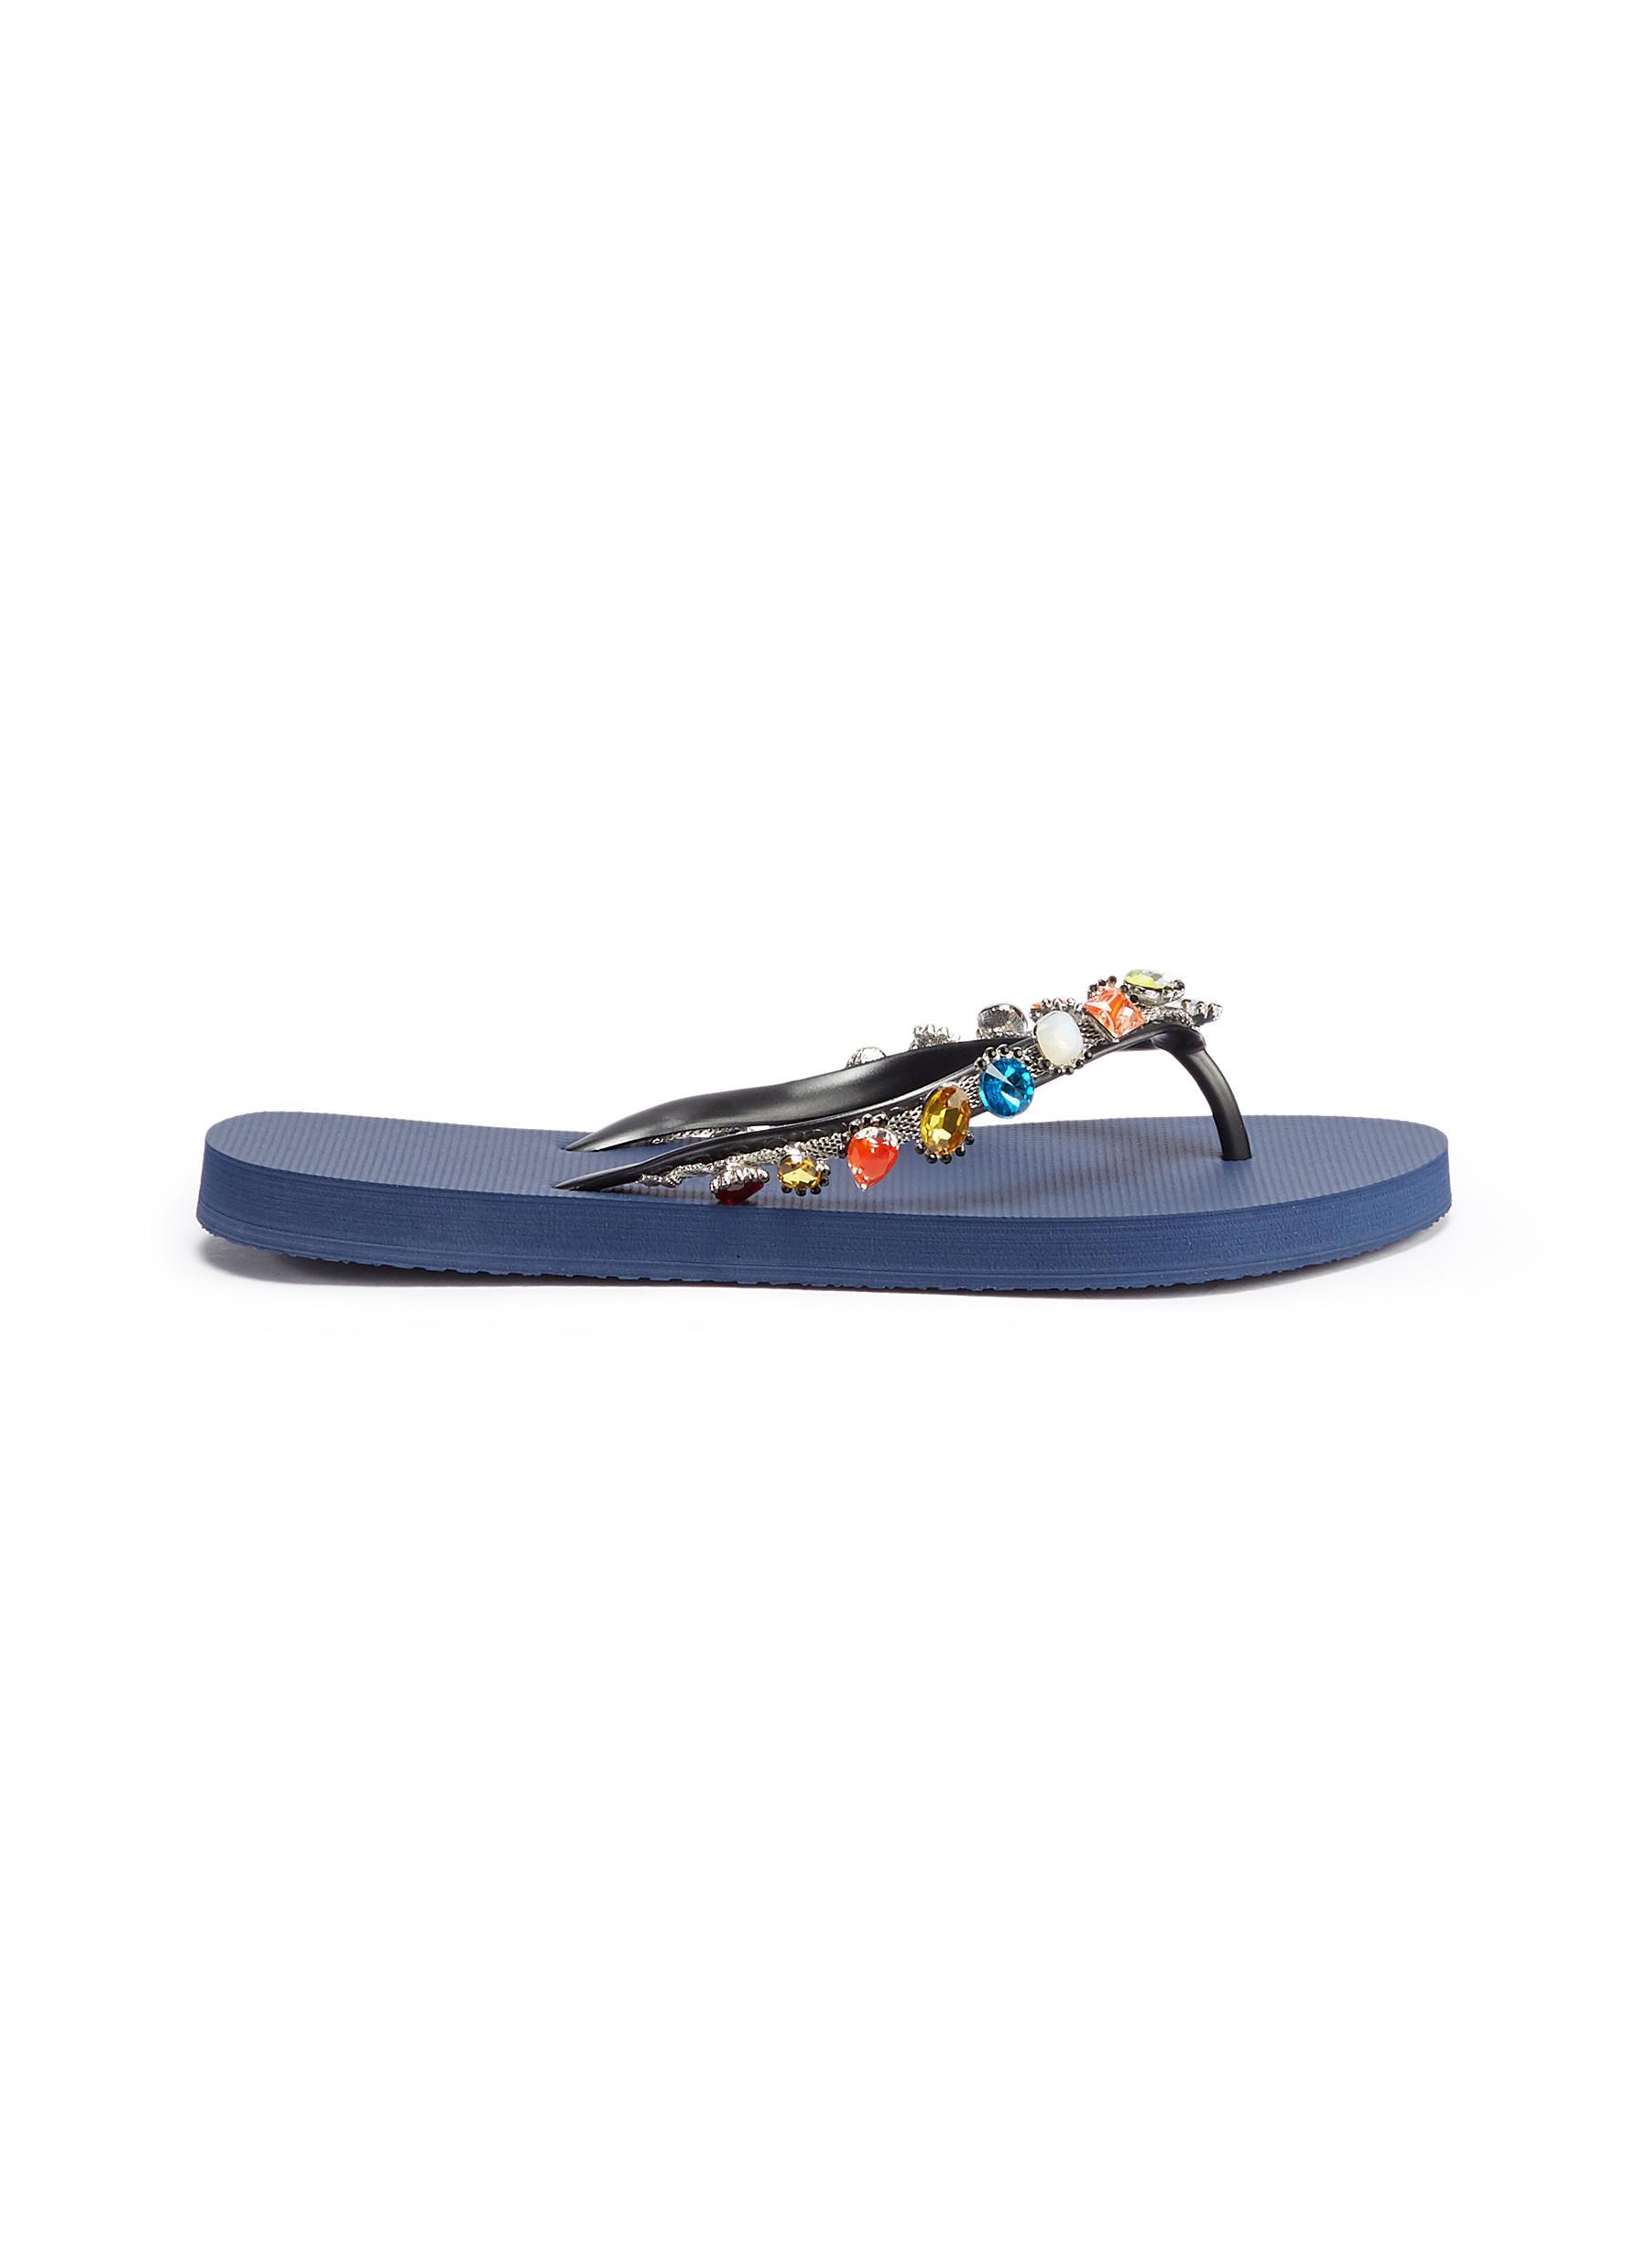 Daisy crystal thong sandals by Uzurii